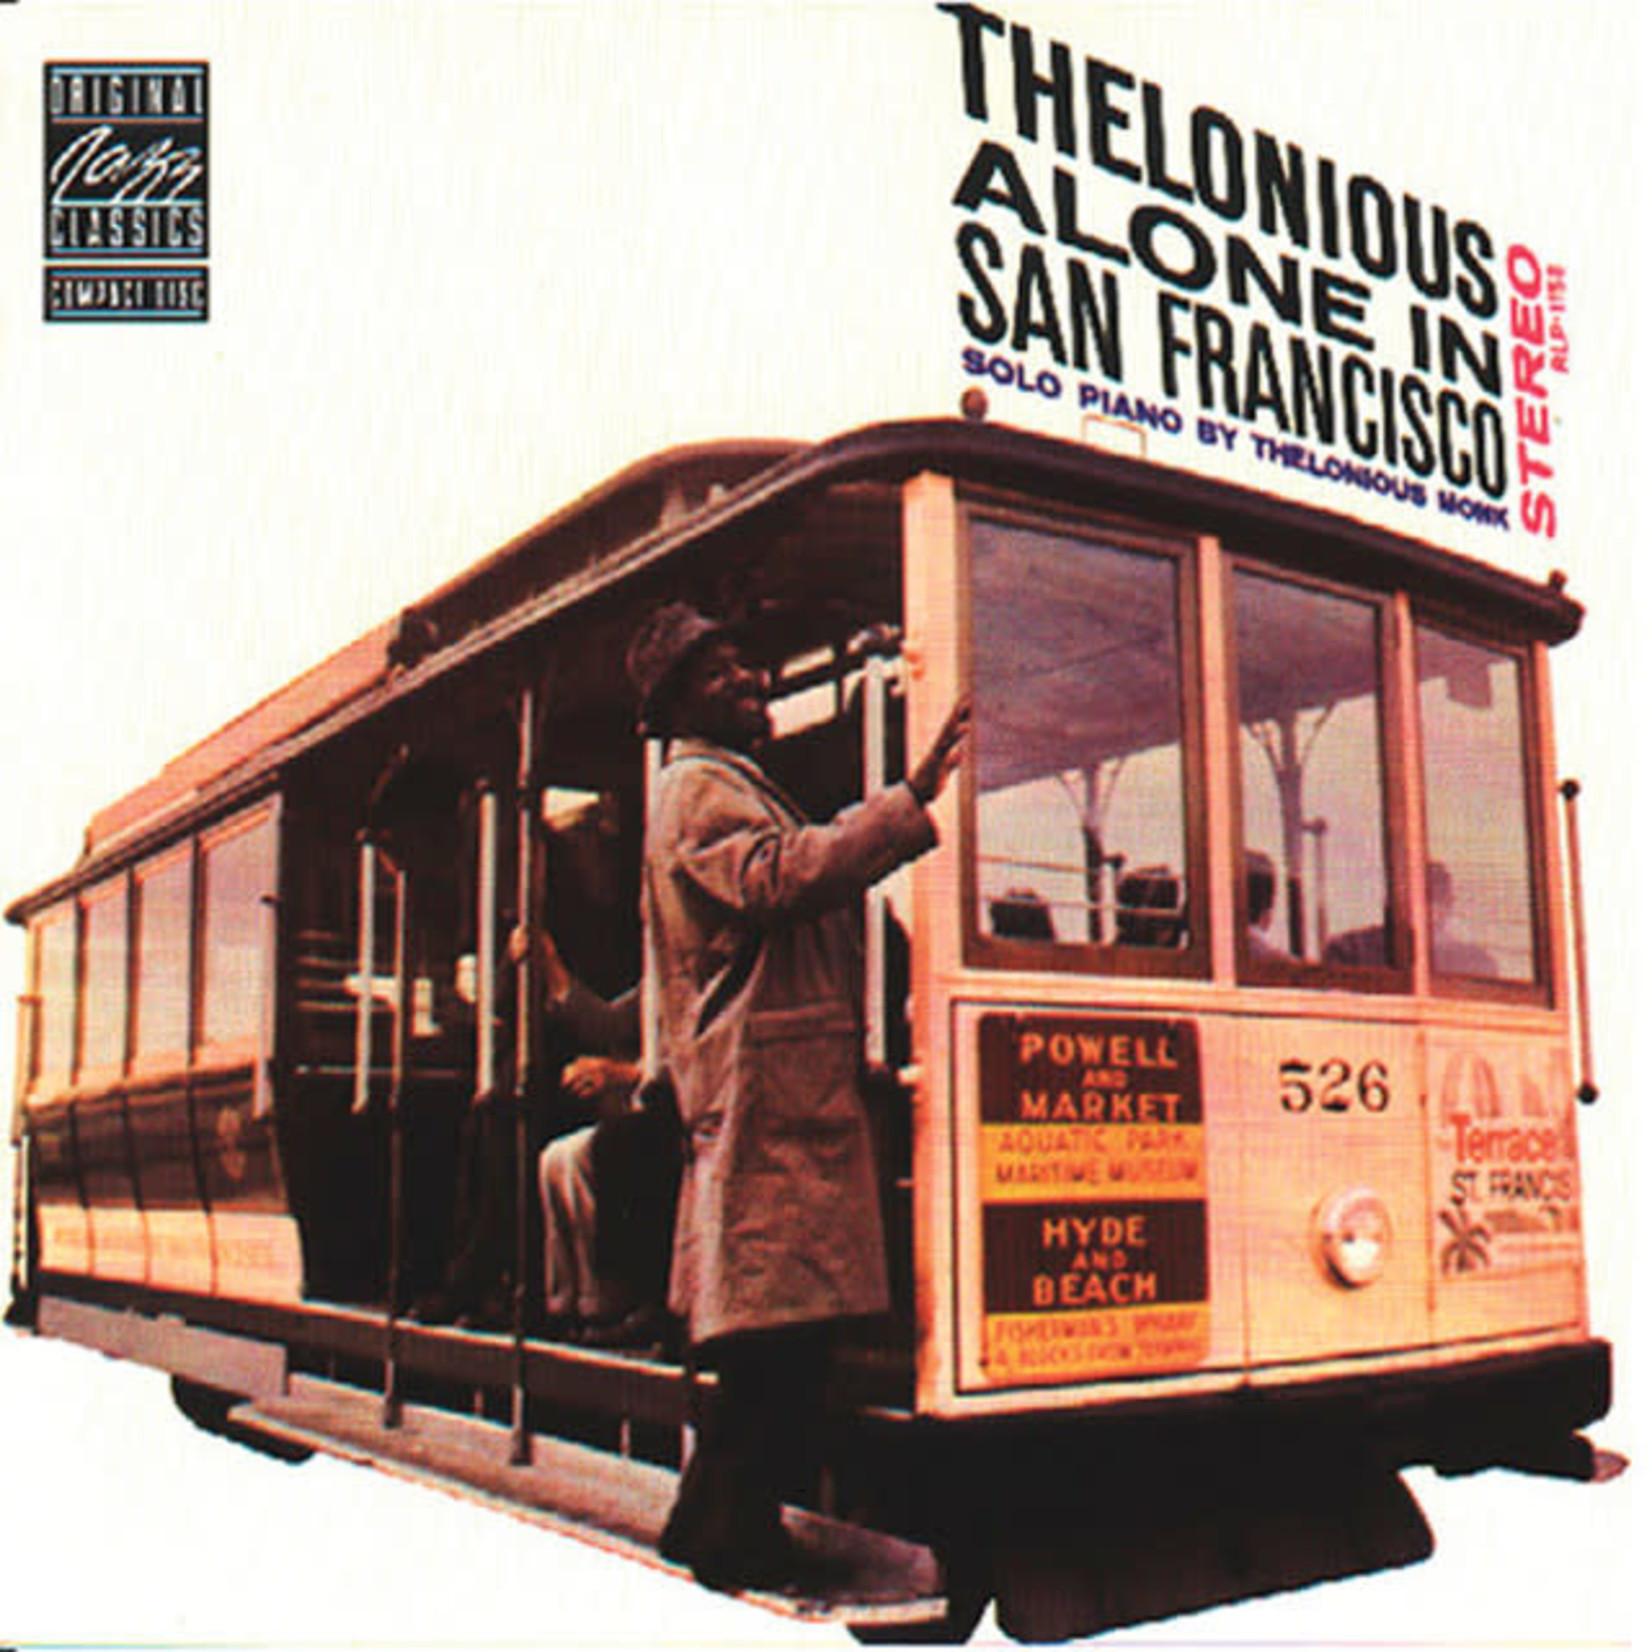 Vinyl Thelonious Monk - Alone In San Francisco